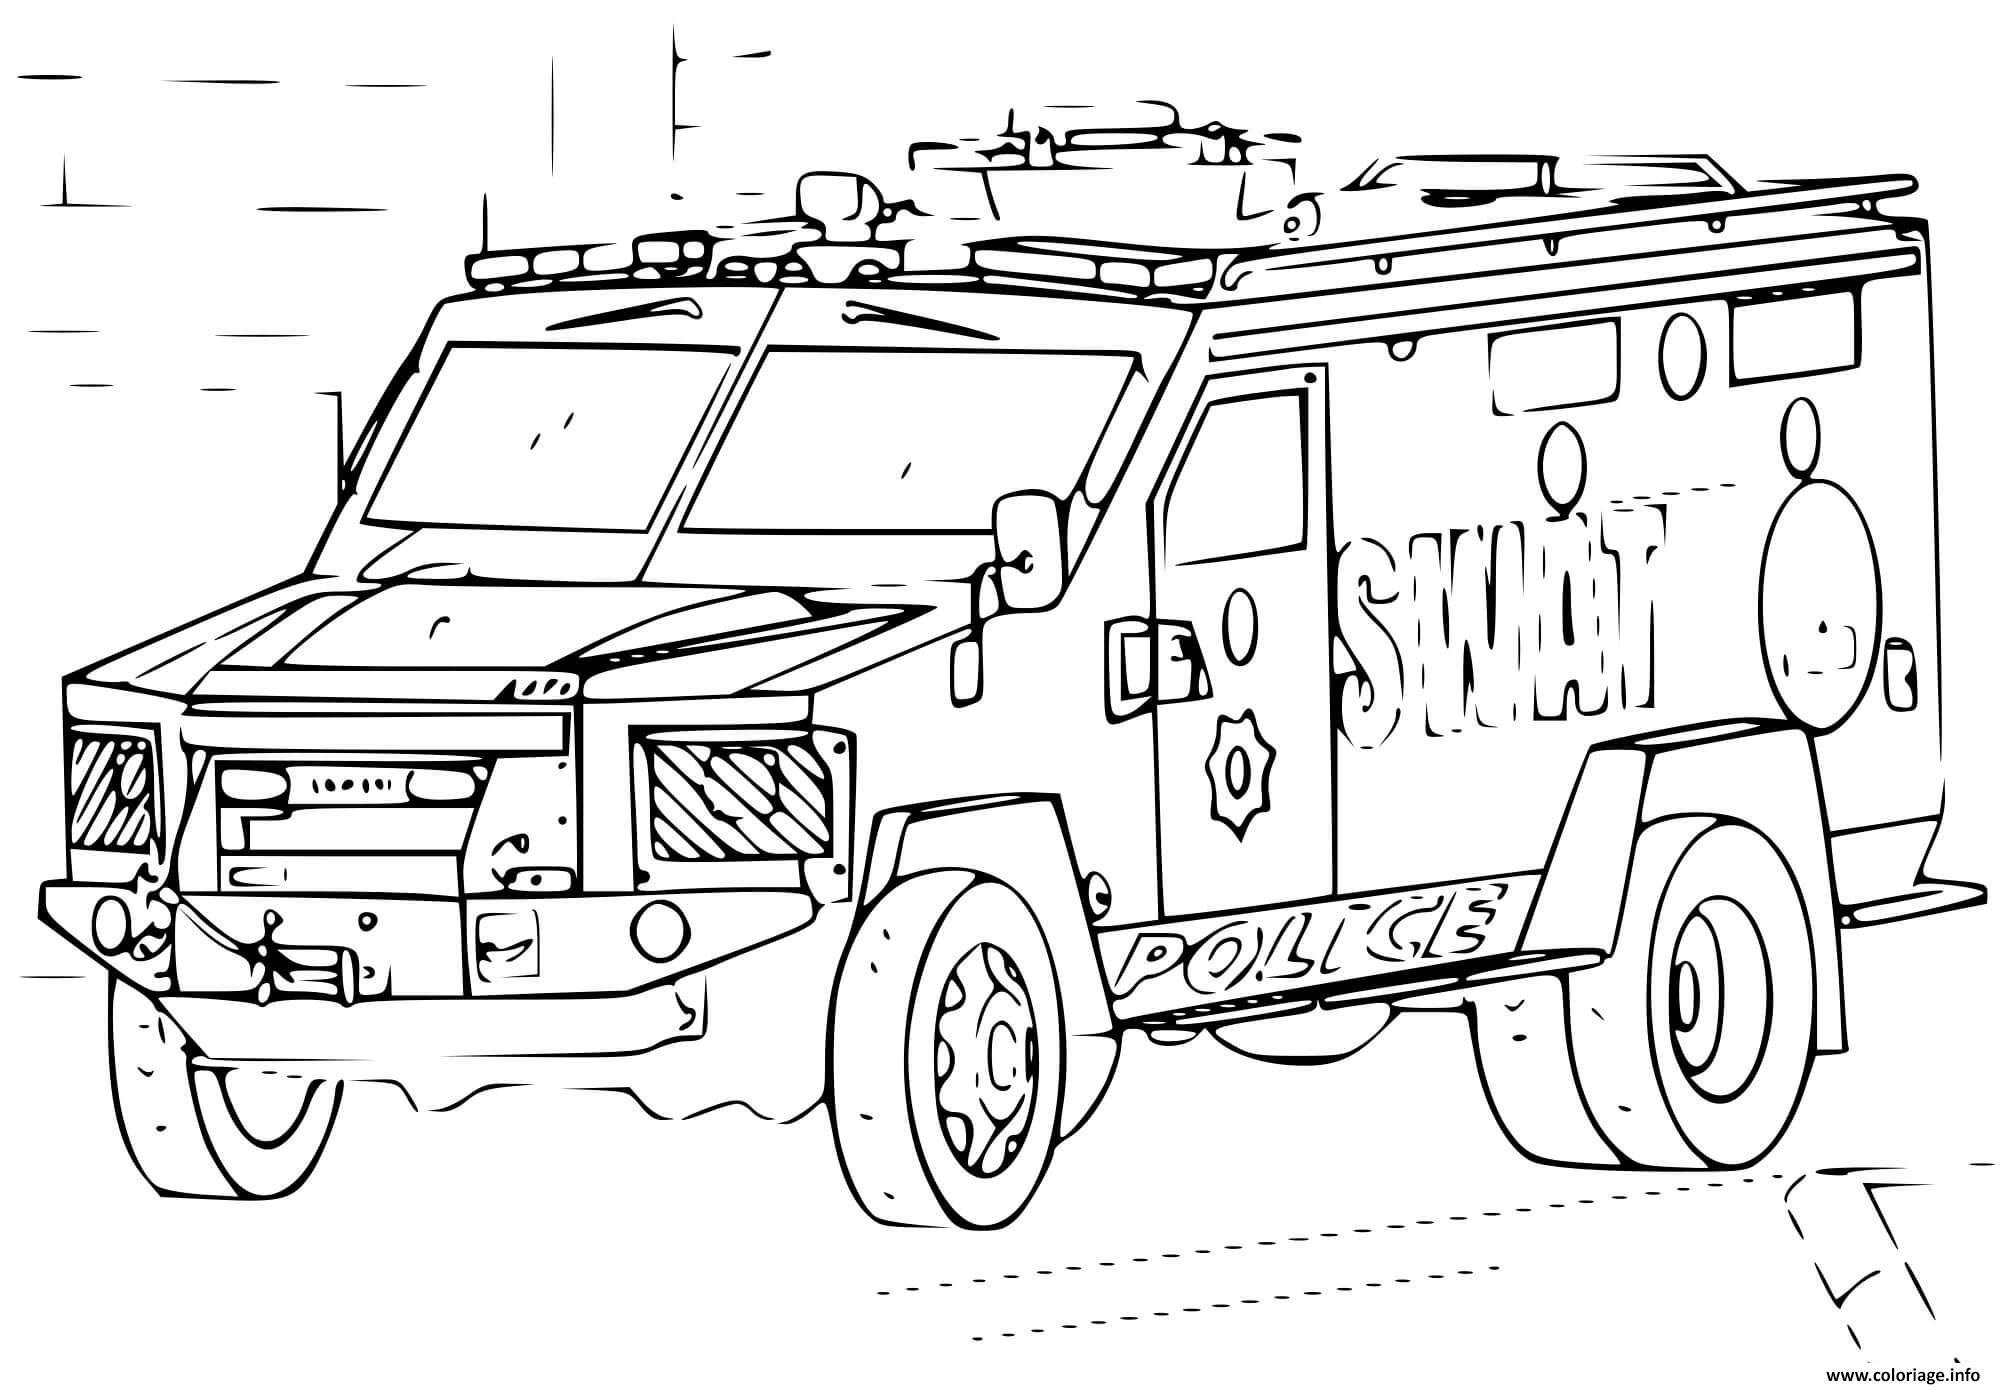 Coloriage voiture SWAT 4x4 Police - JeColorie.com